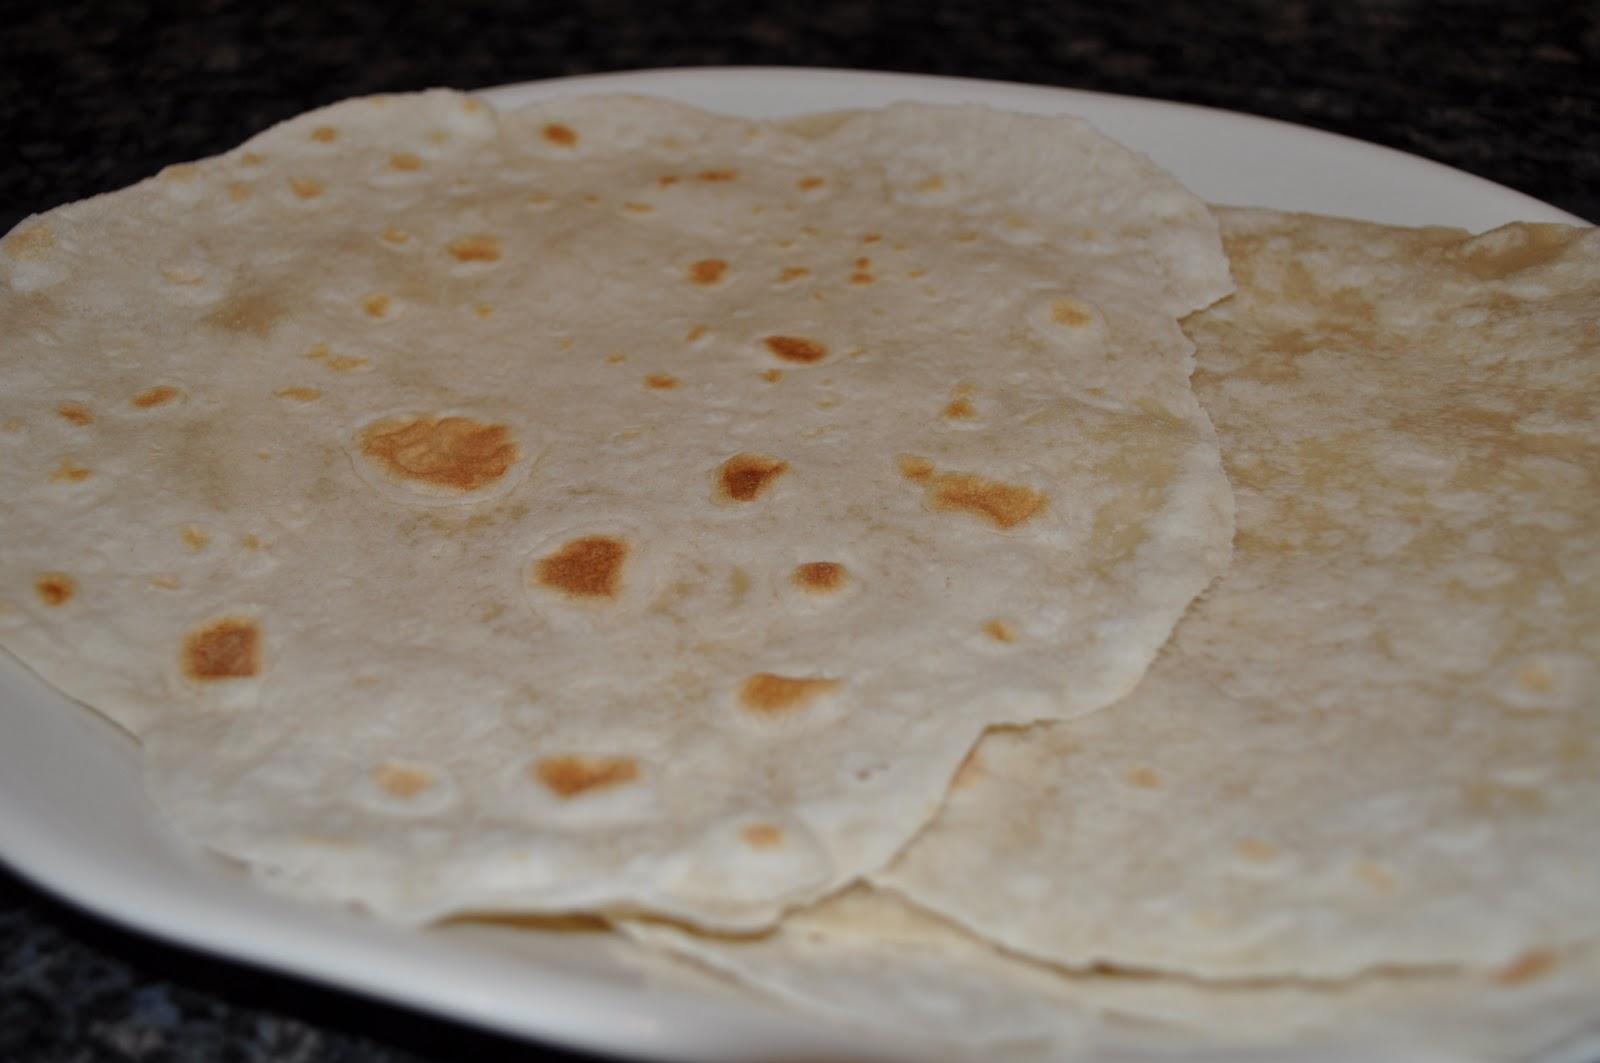 seeshellspace: Homemade Flour Tortillas